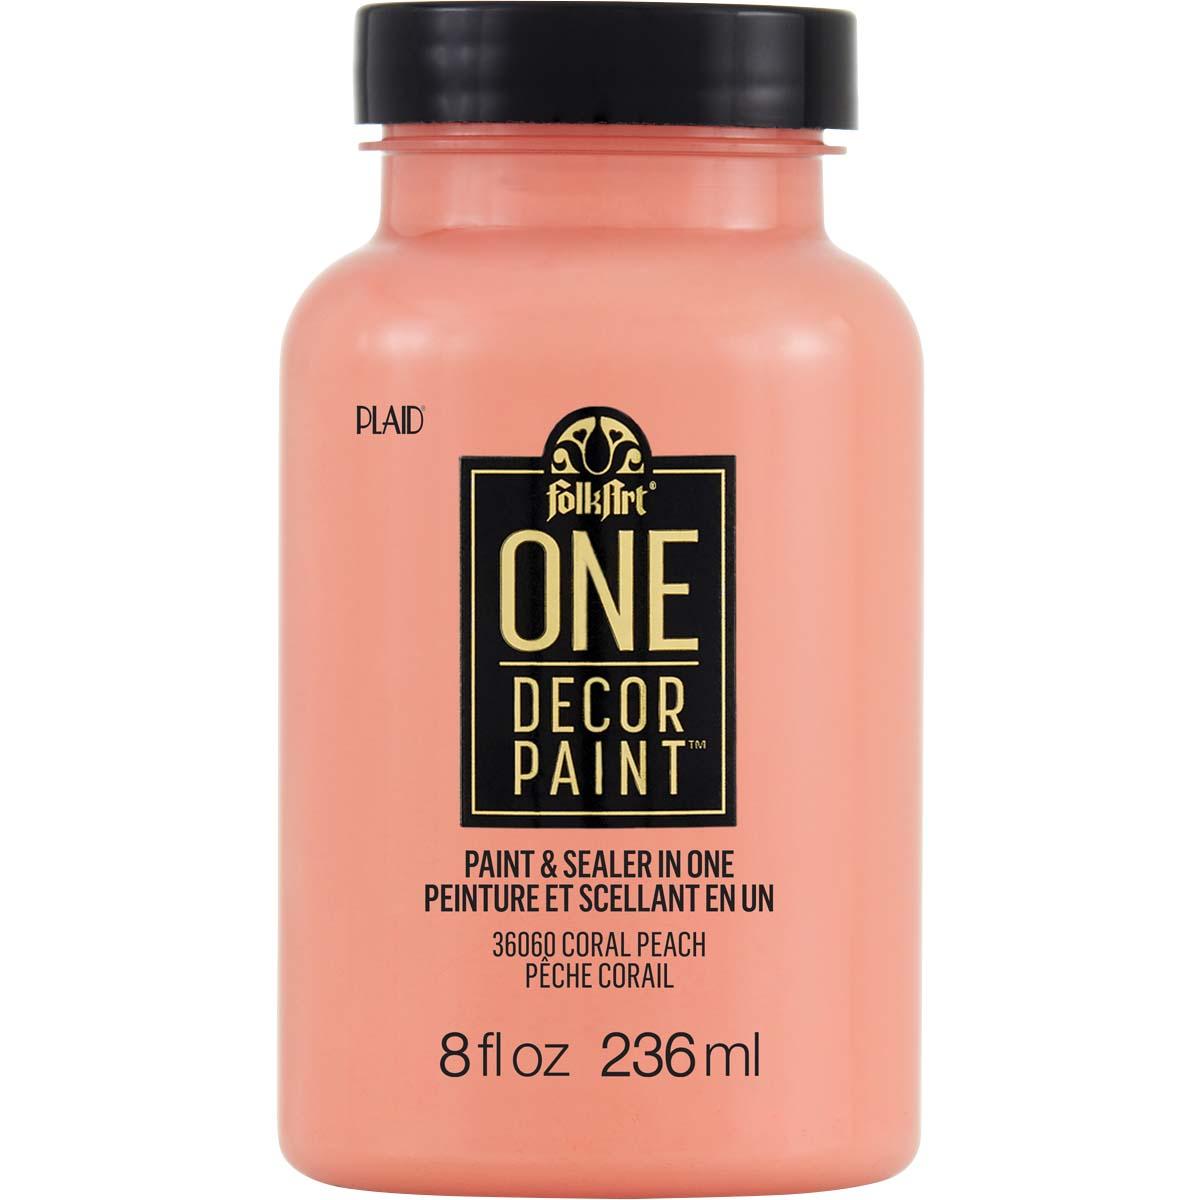 FolkArt ® One Décor Paint™ - Coral Peach, 8 oz. - 36060